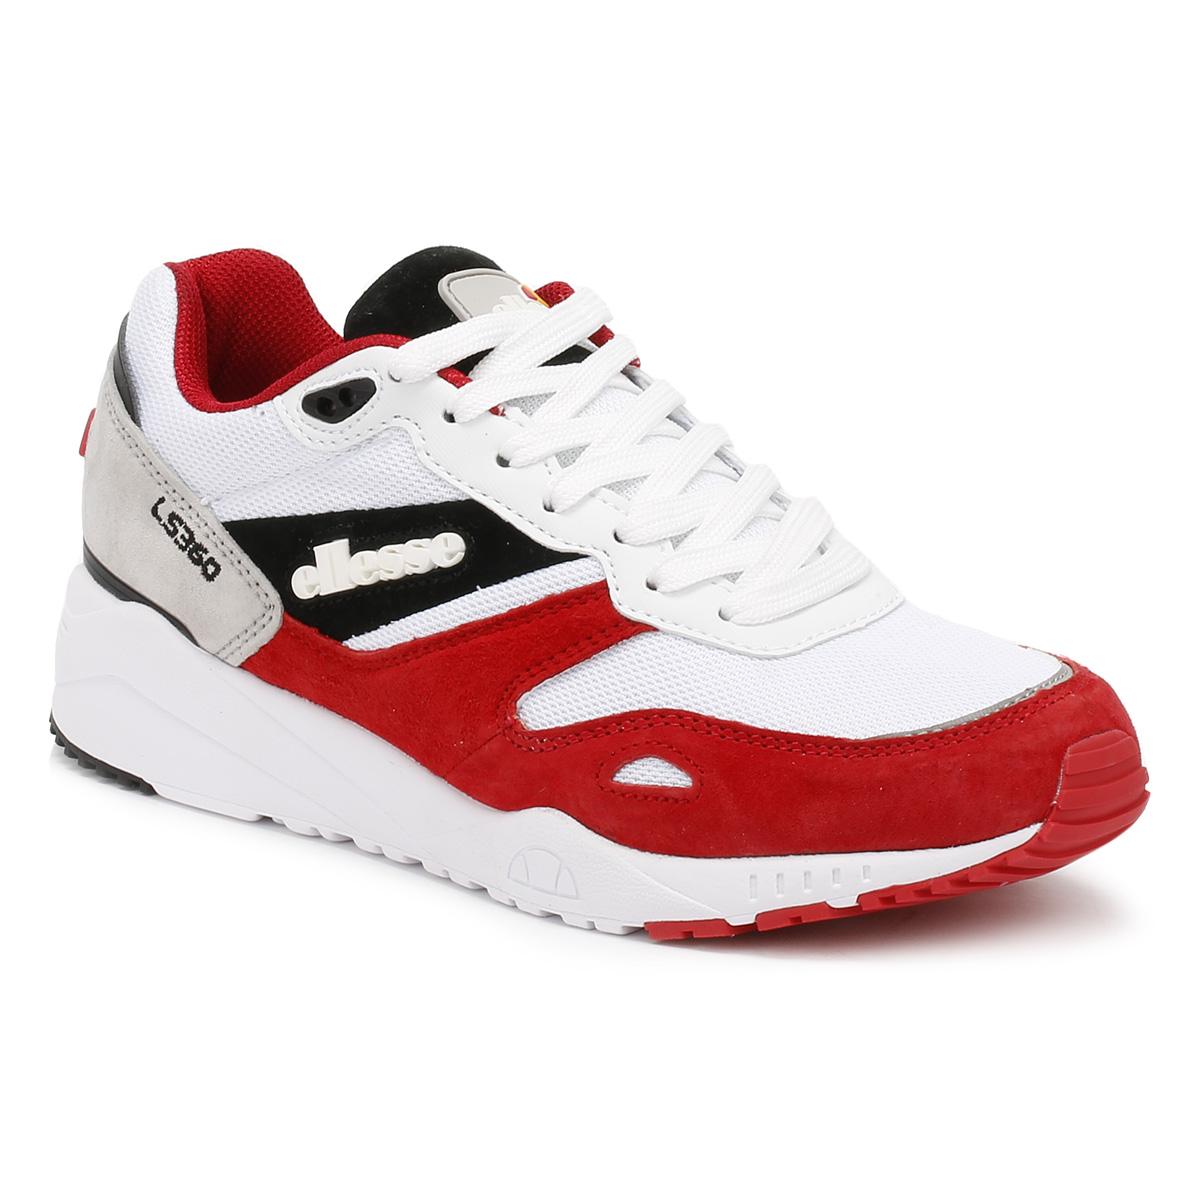 Ellesse Running Shoes